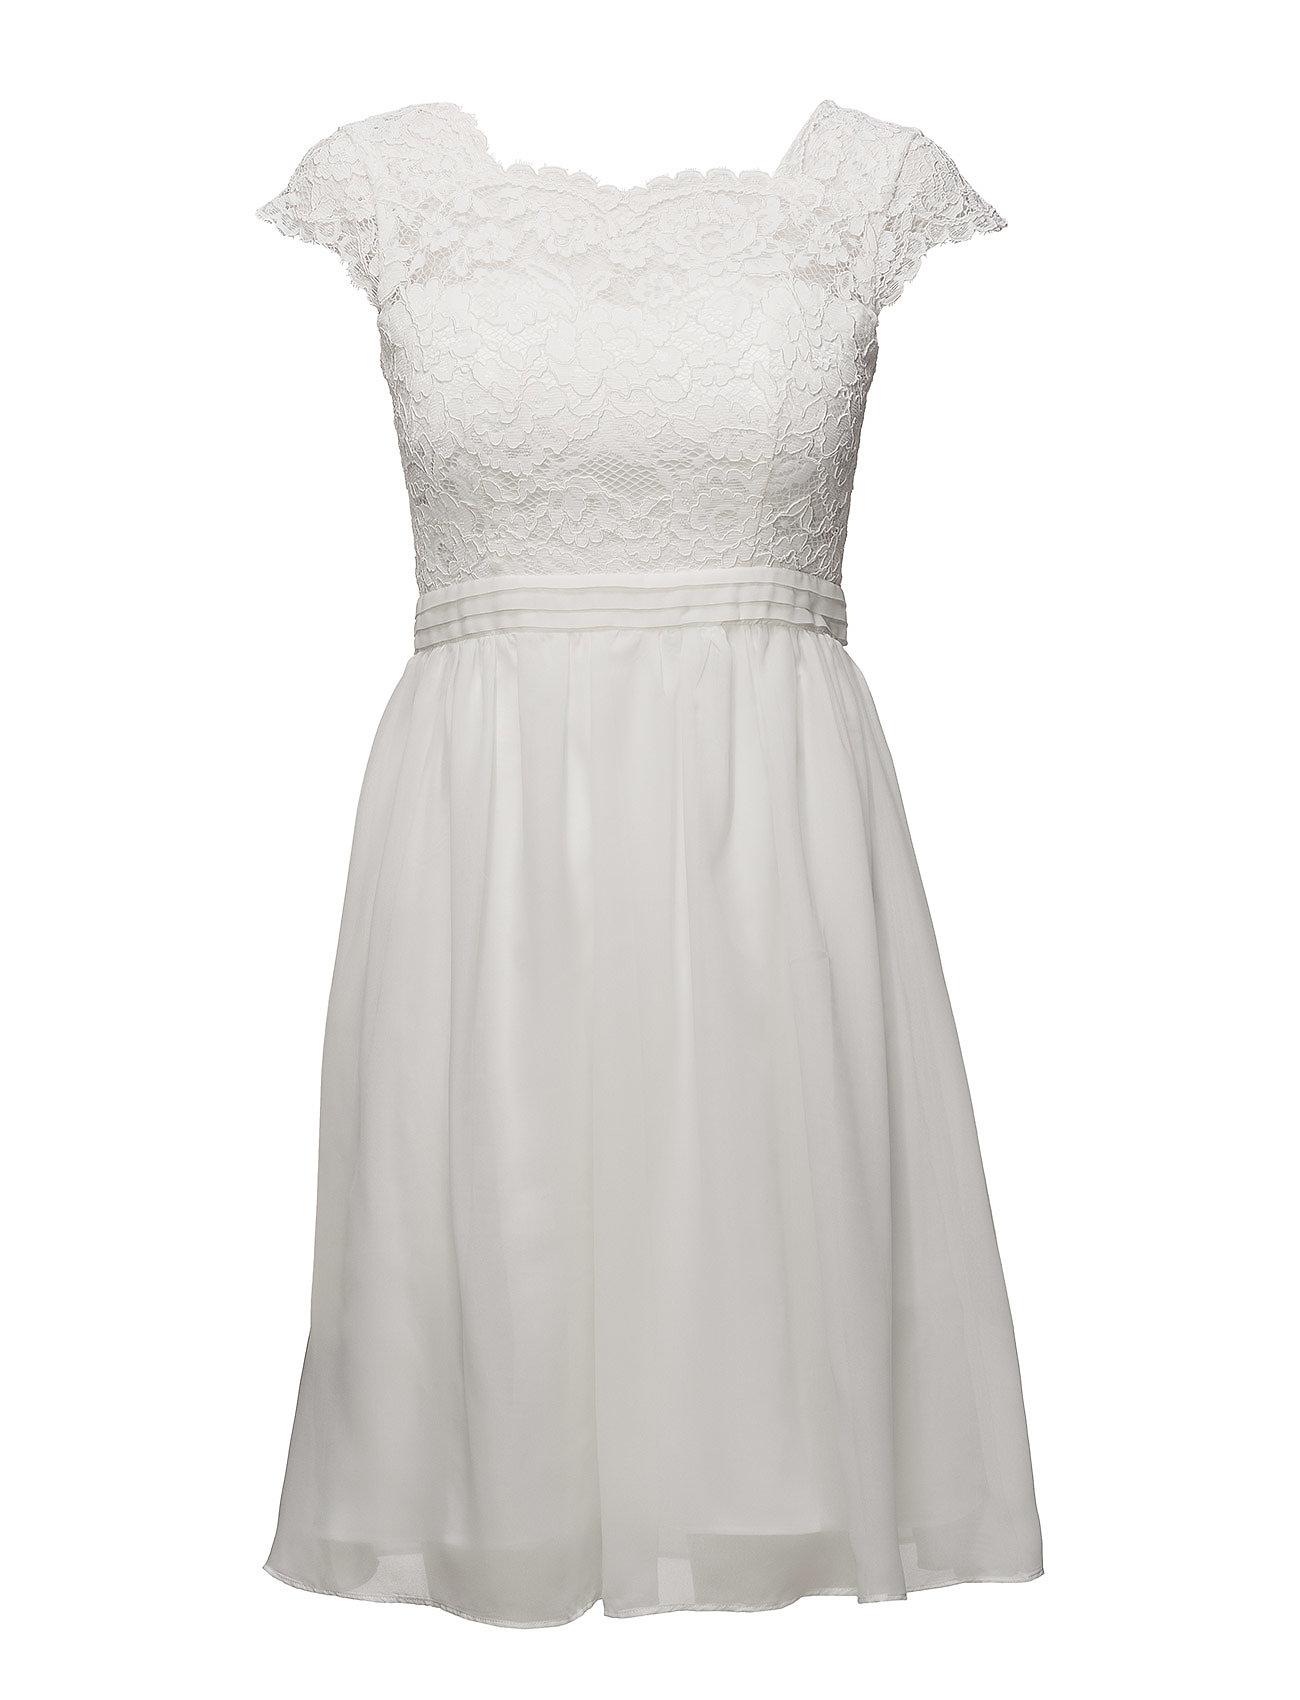 32c1c57f4 Ivy Dress (Cloudy White) (£132.30) - By Malina - | Boozt.com